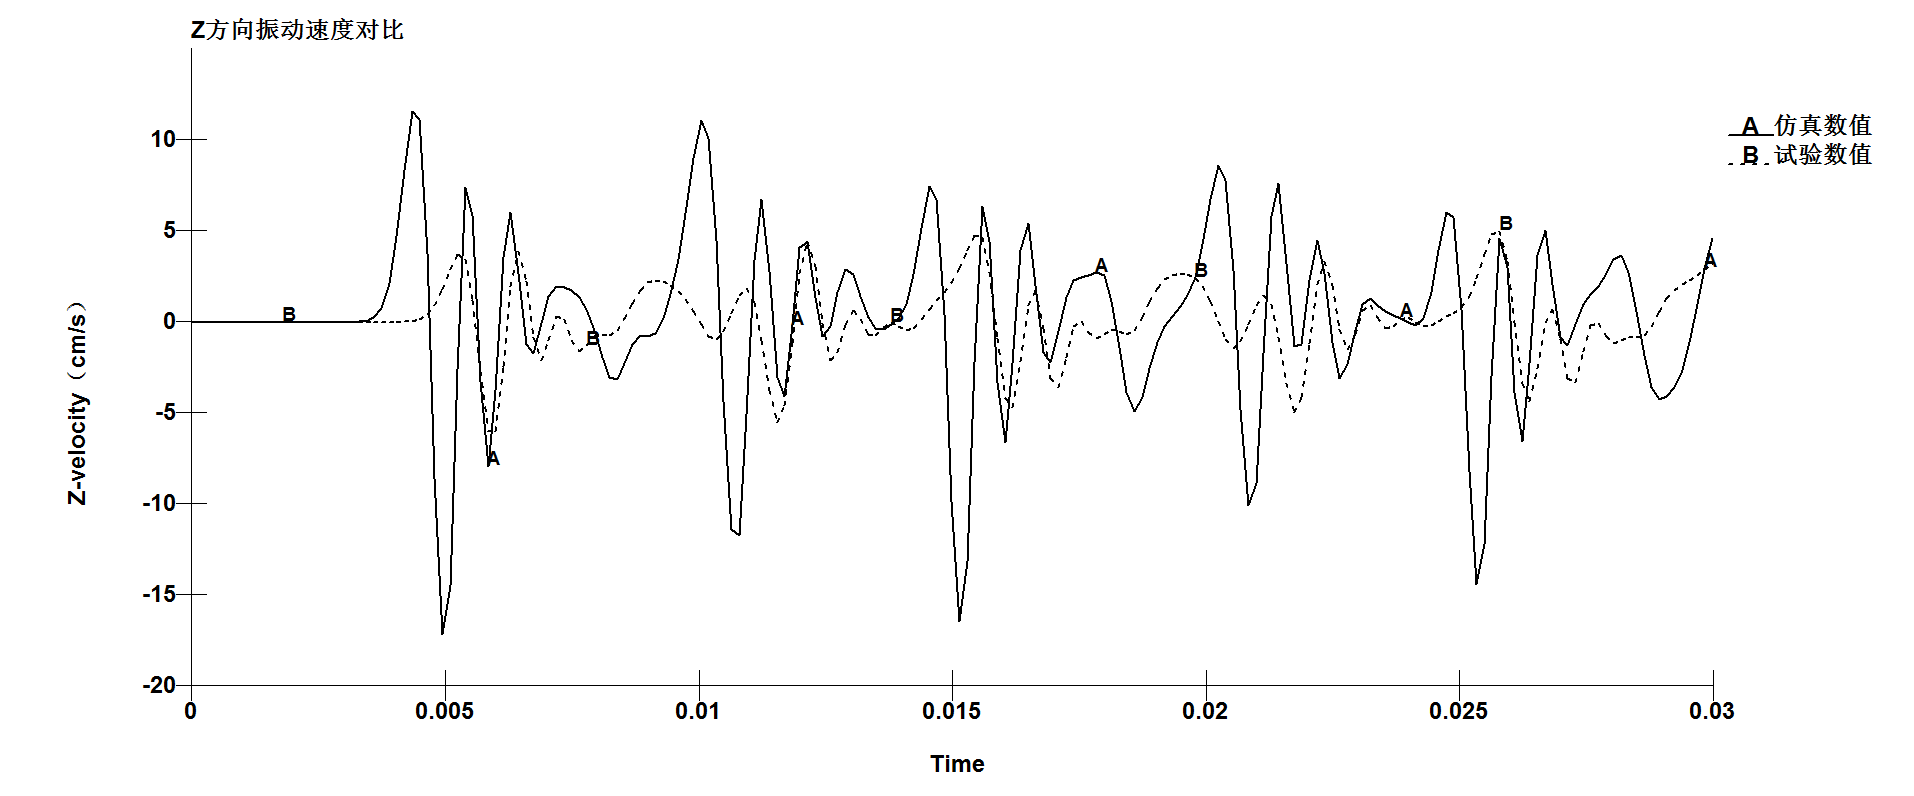 Z方向振动速度对比.png